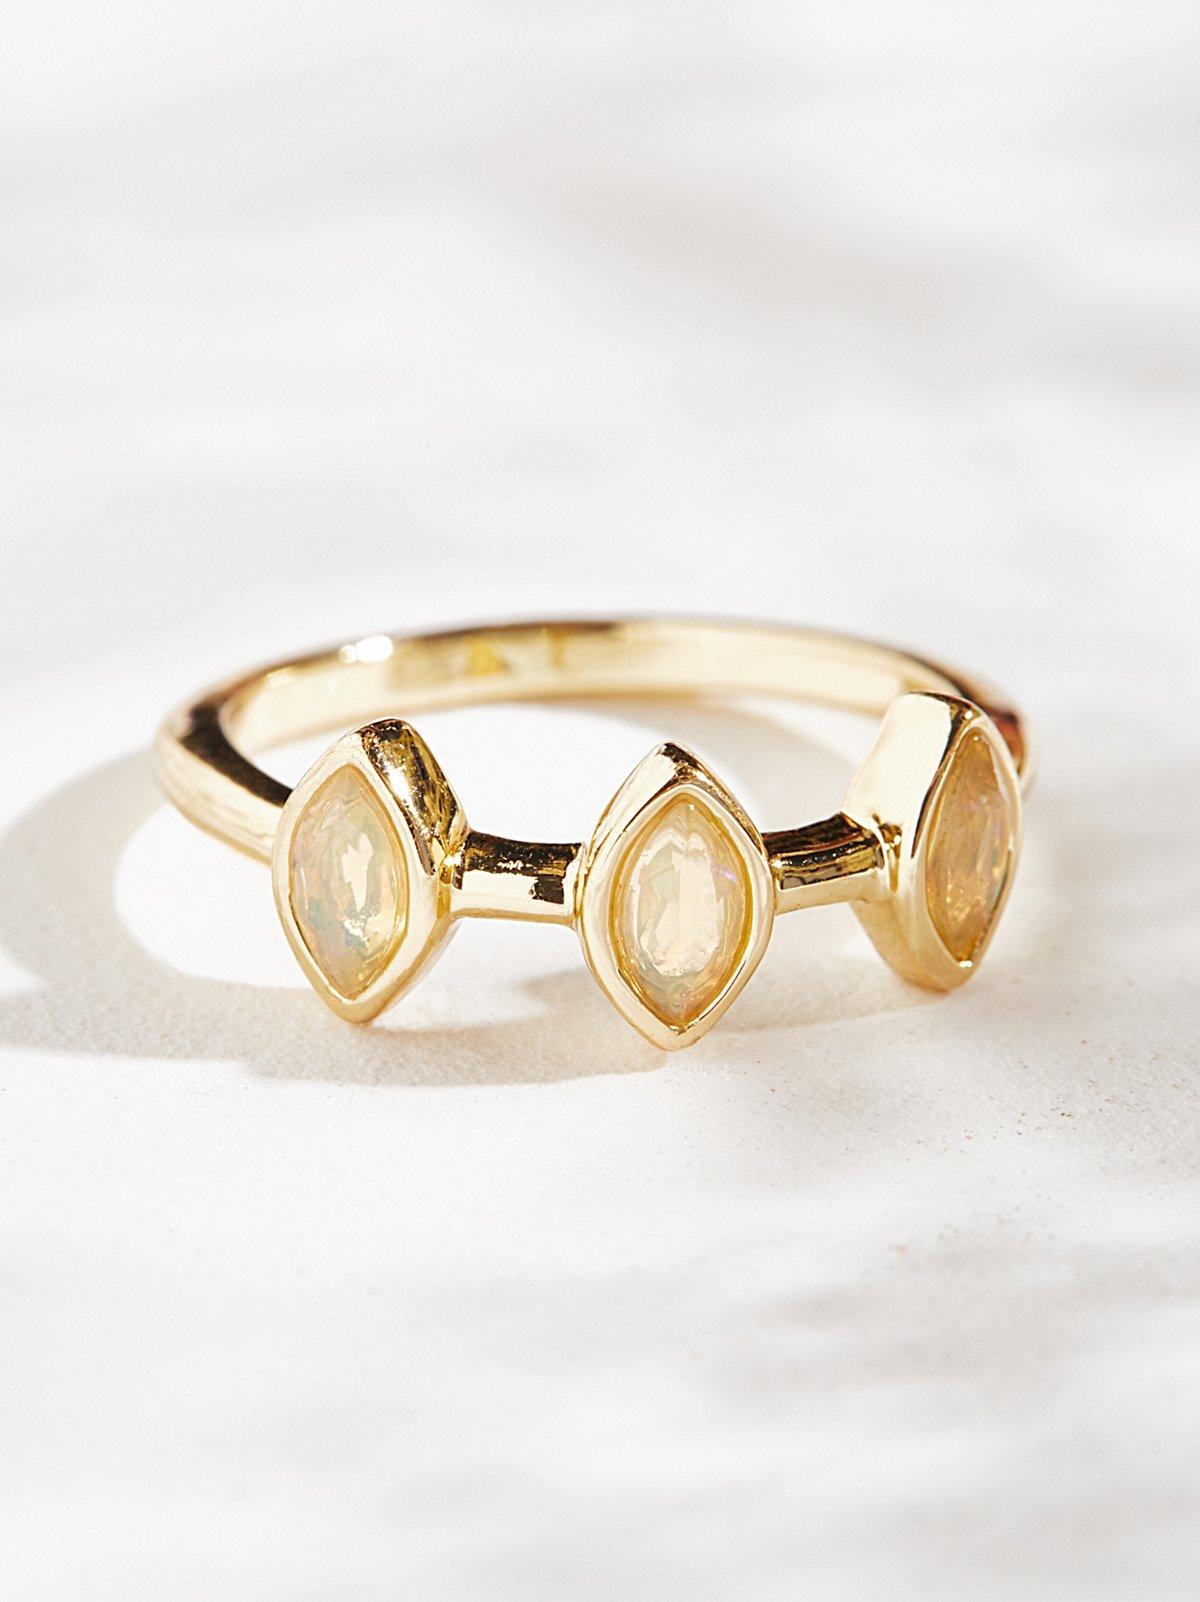 Triple Crown蛋白石戒指